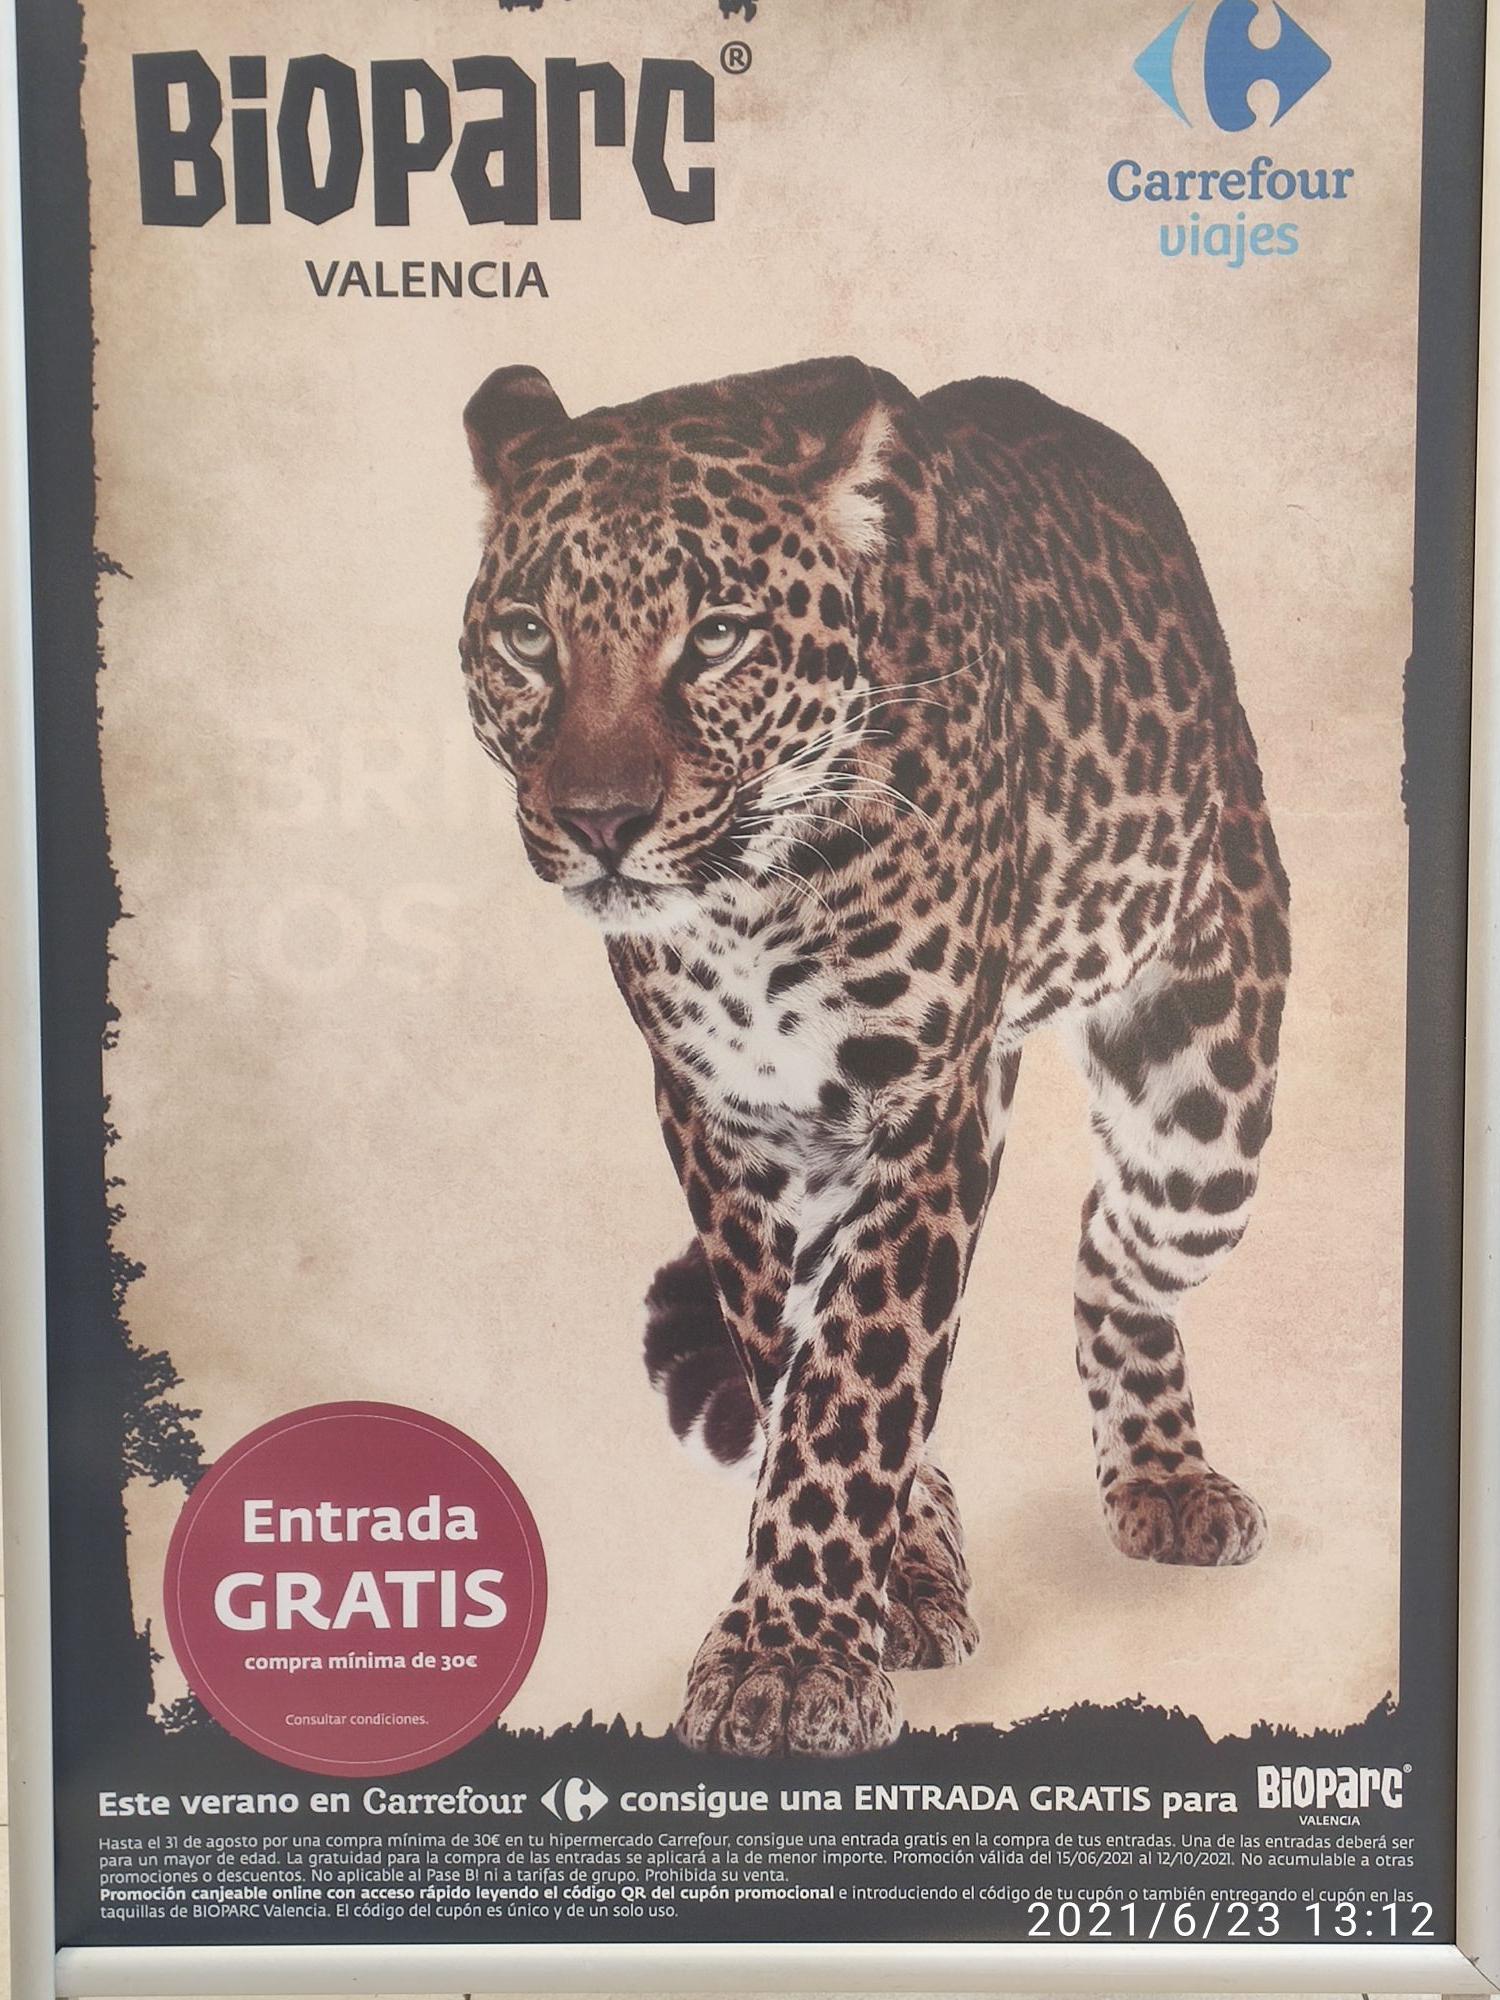 2x1 en Bioparc Valencia